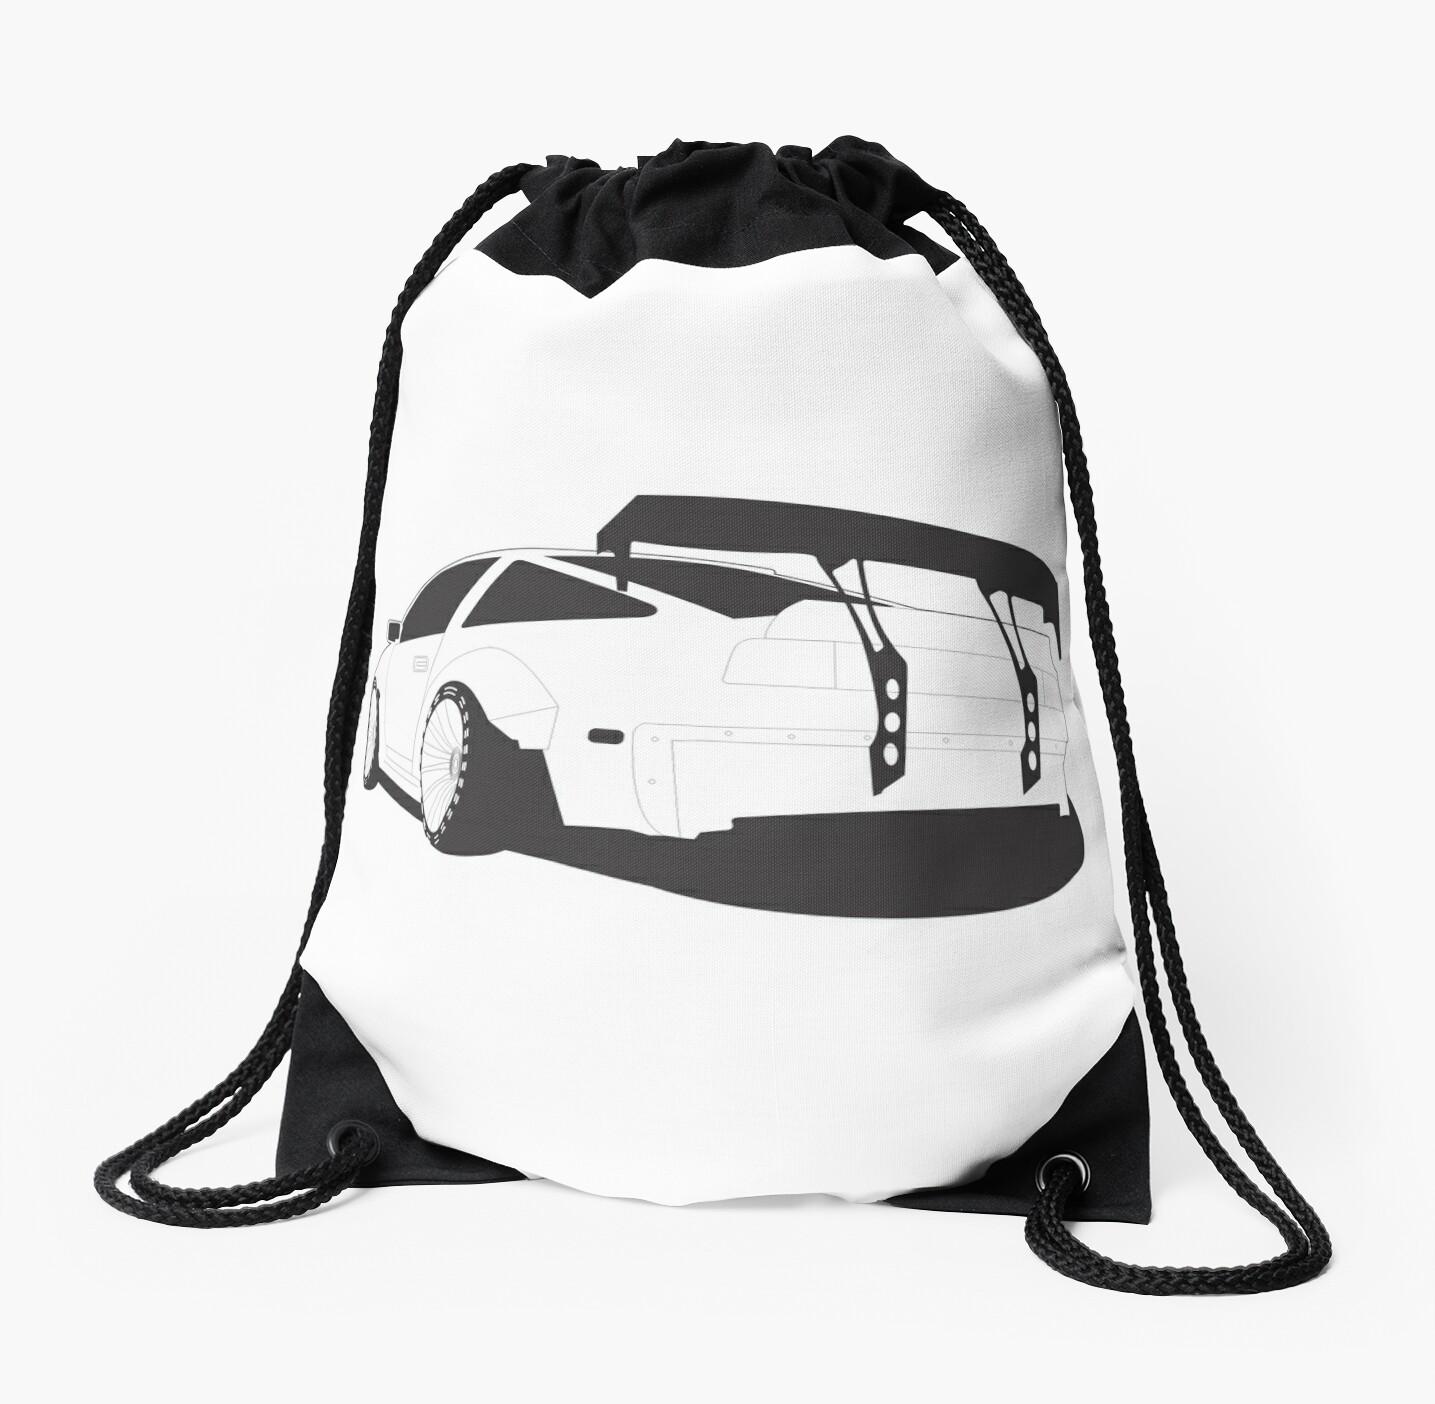 Z31 Widebody Drawstring Bag By Neuefab Redbubble